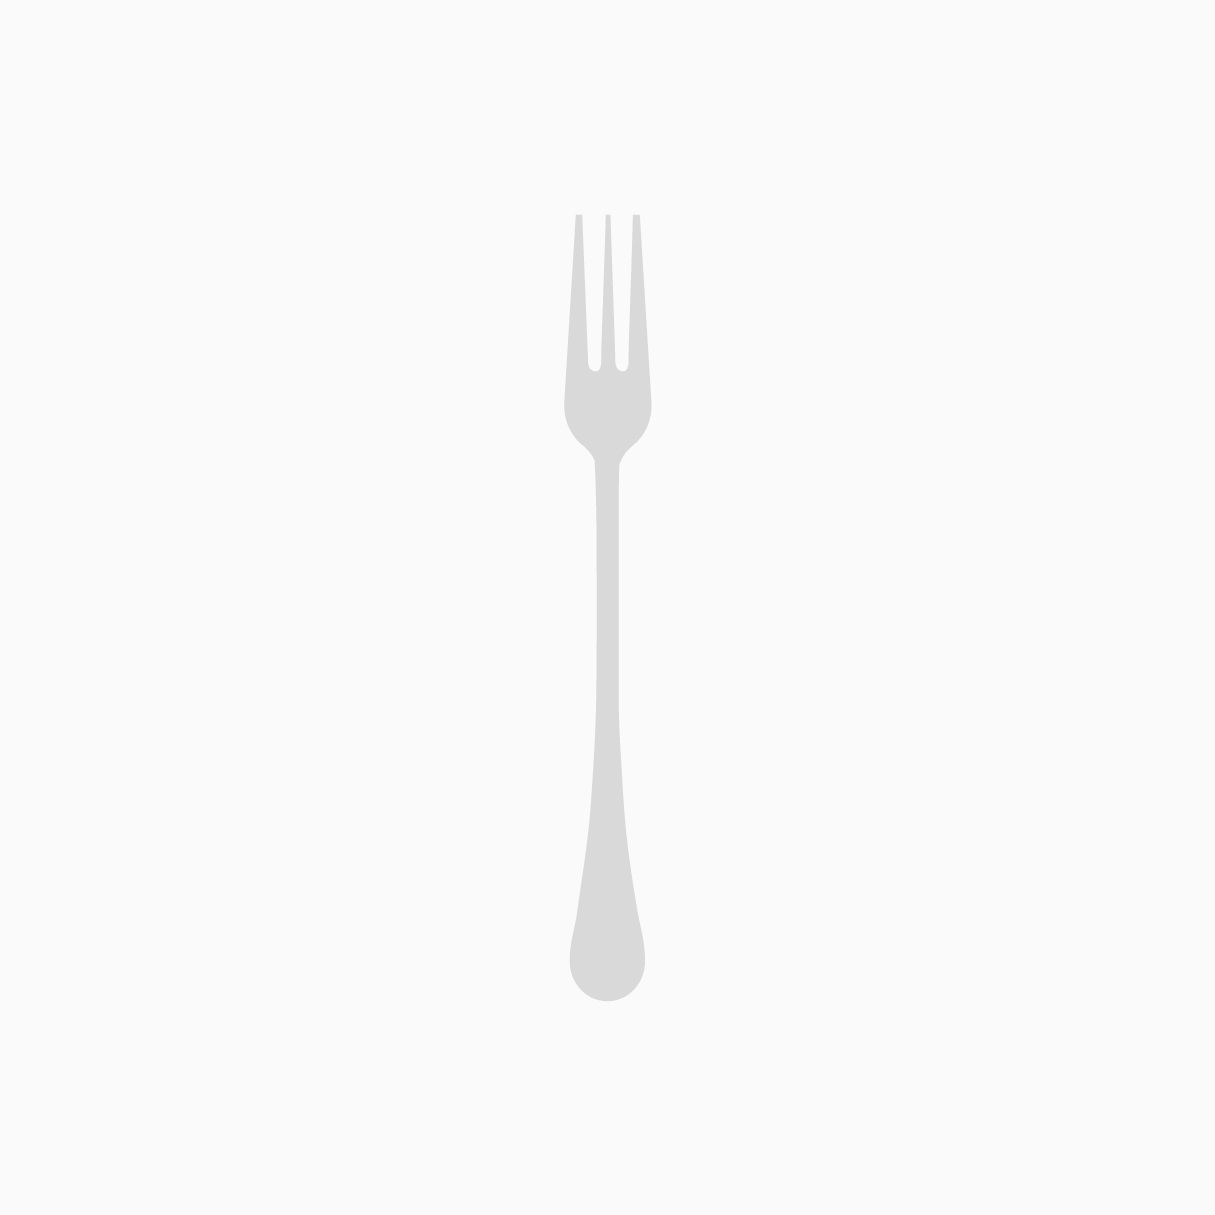 Steak / Spaghetti-Fork